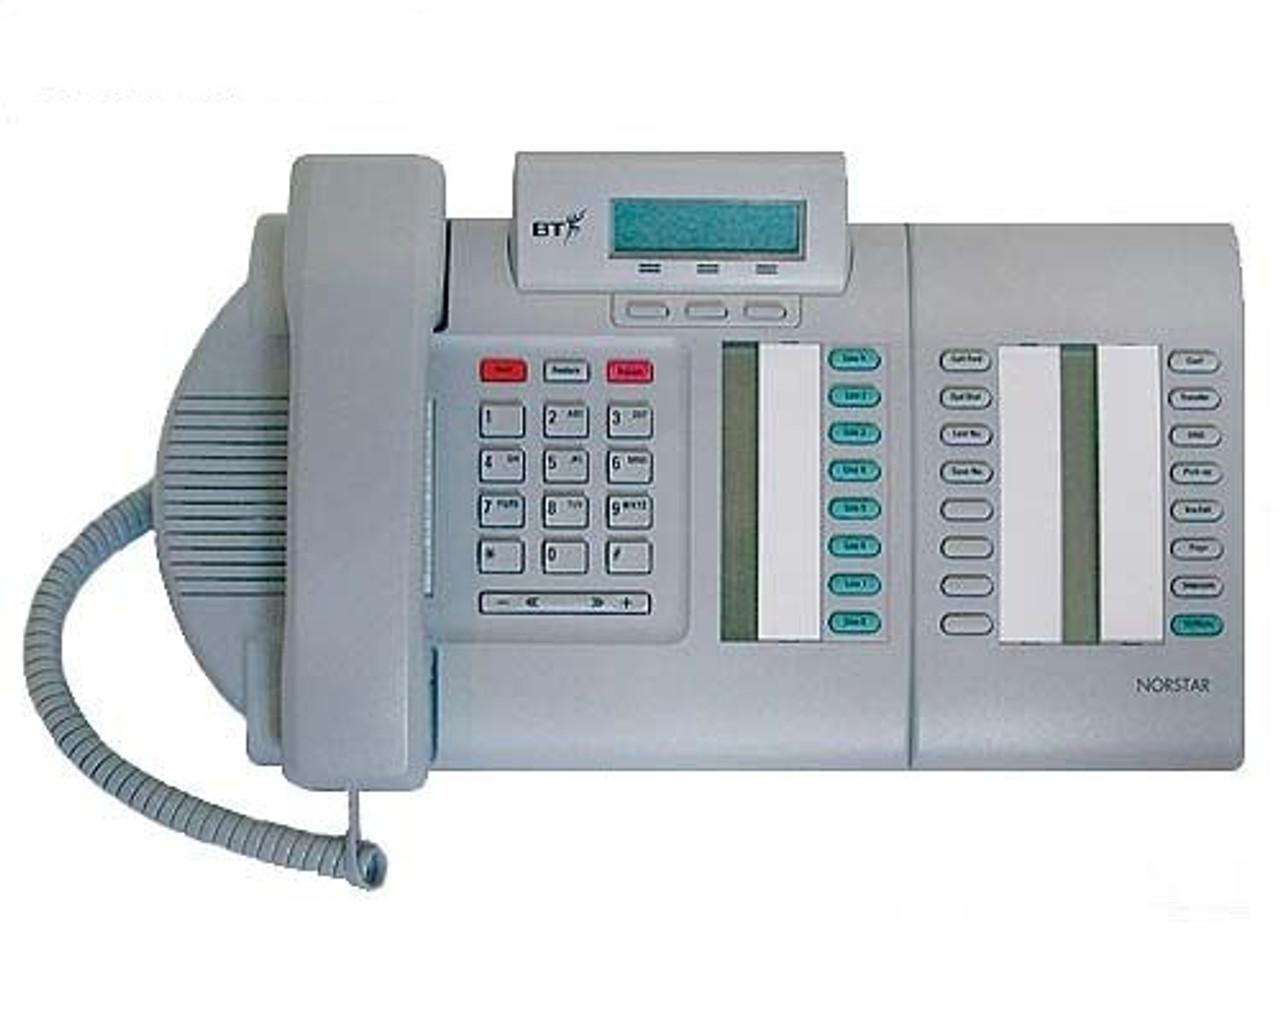 Nortel Norstar BT 11 x T7208 phones available